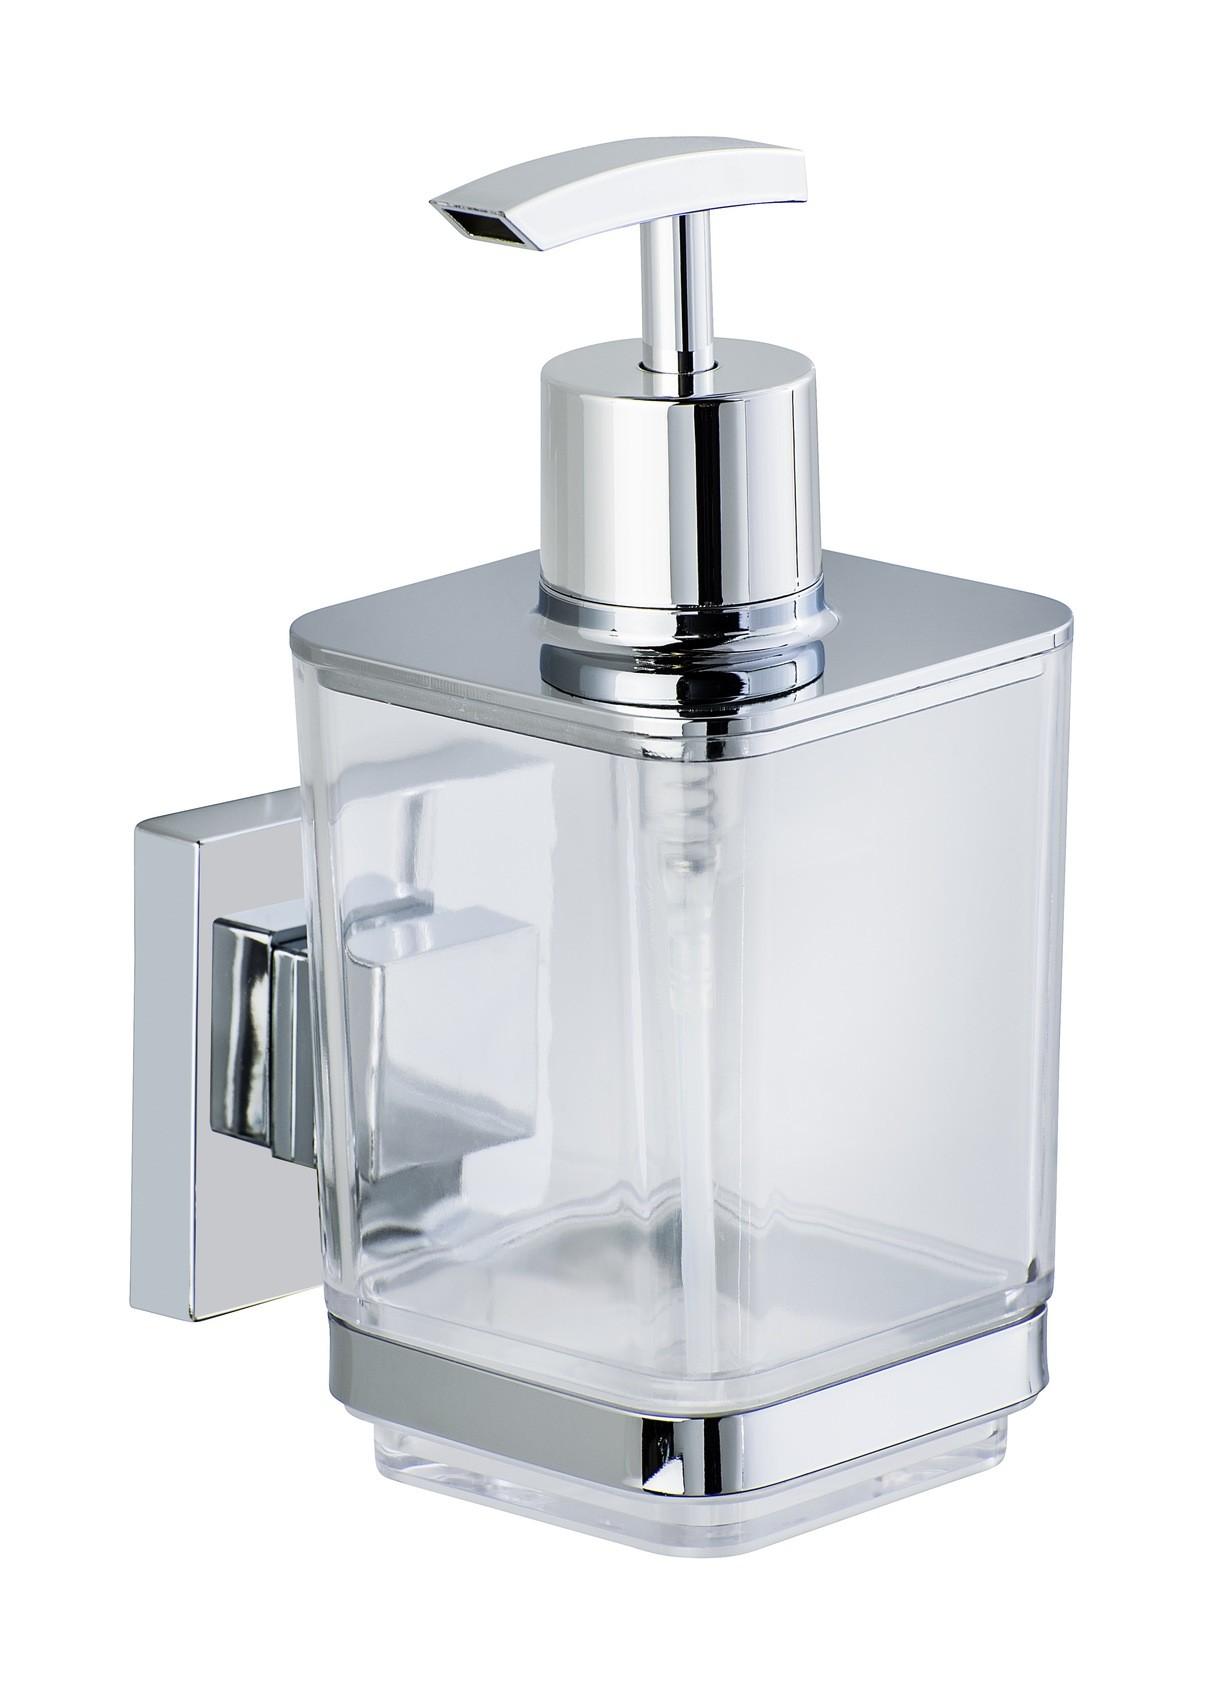 Wenko Vacuum-Loc® Seifenspender Quadro, Edelstahl, Befestigen ohne bohren